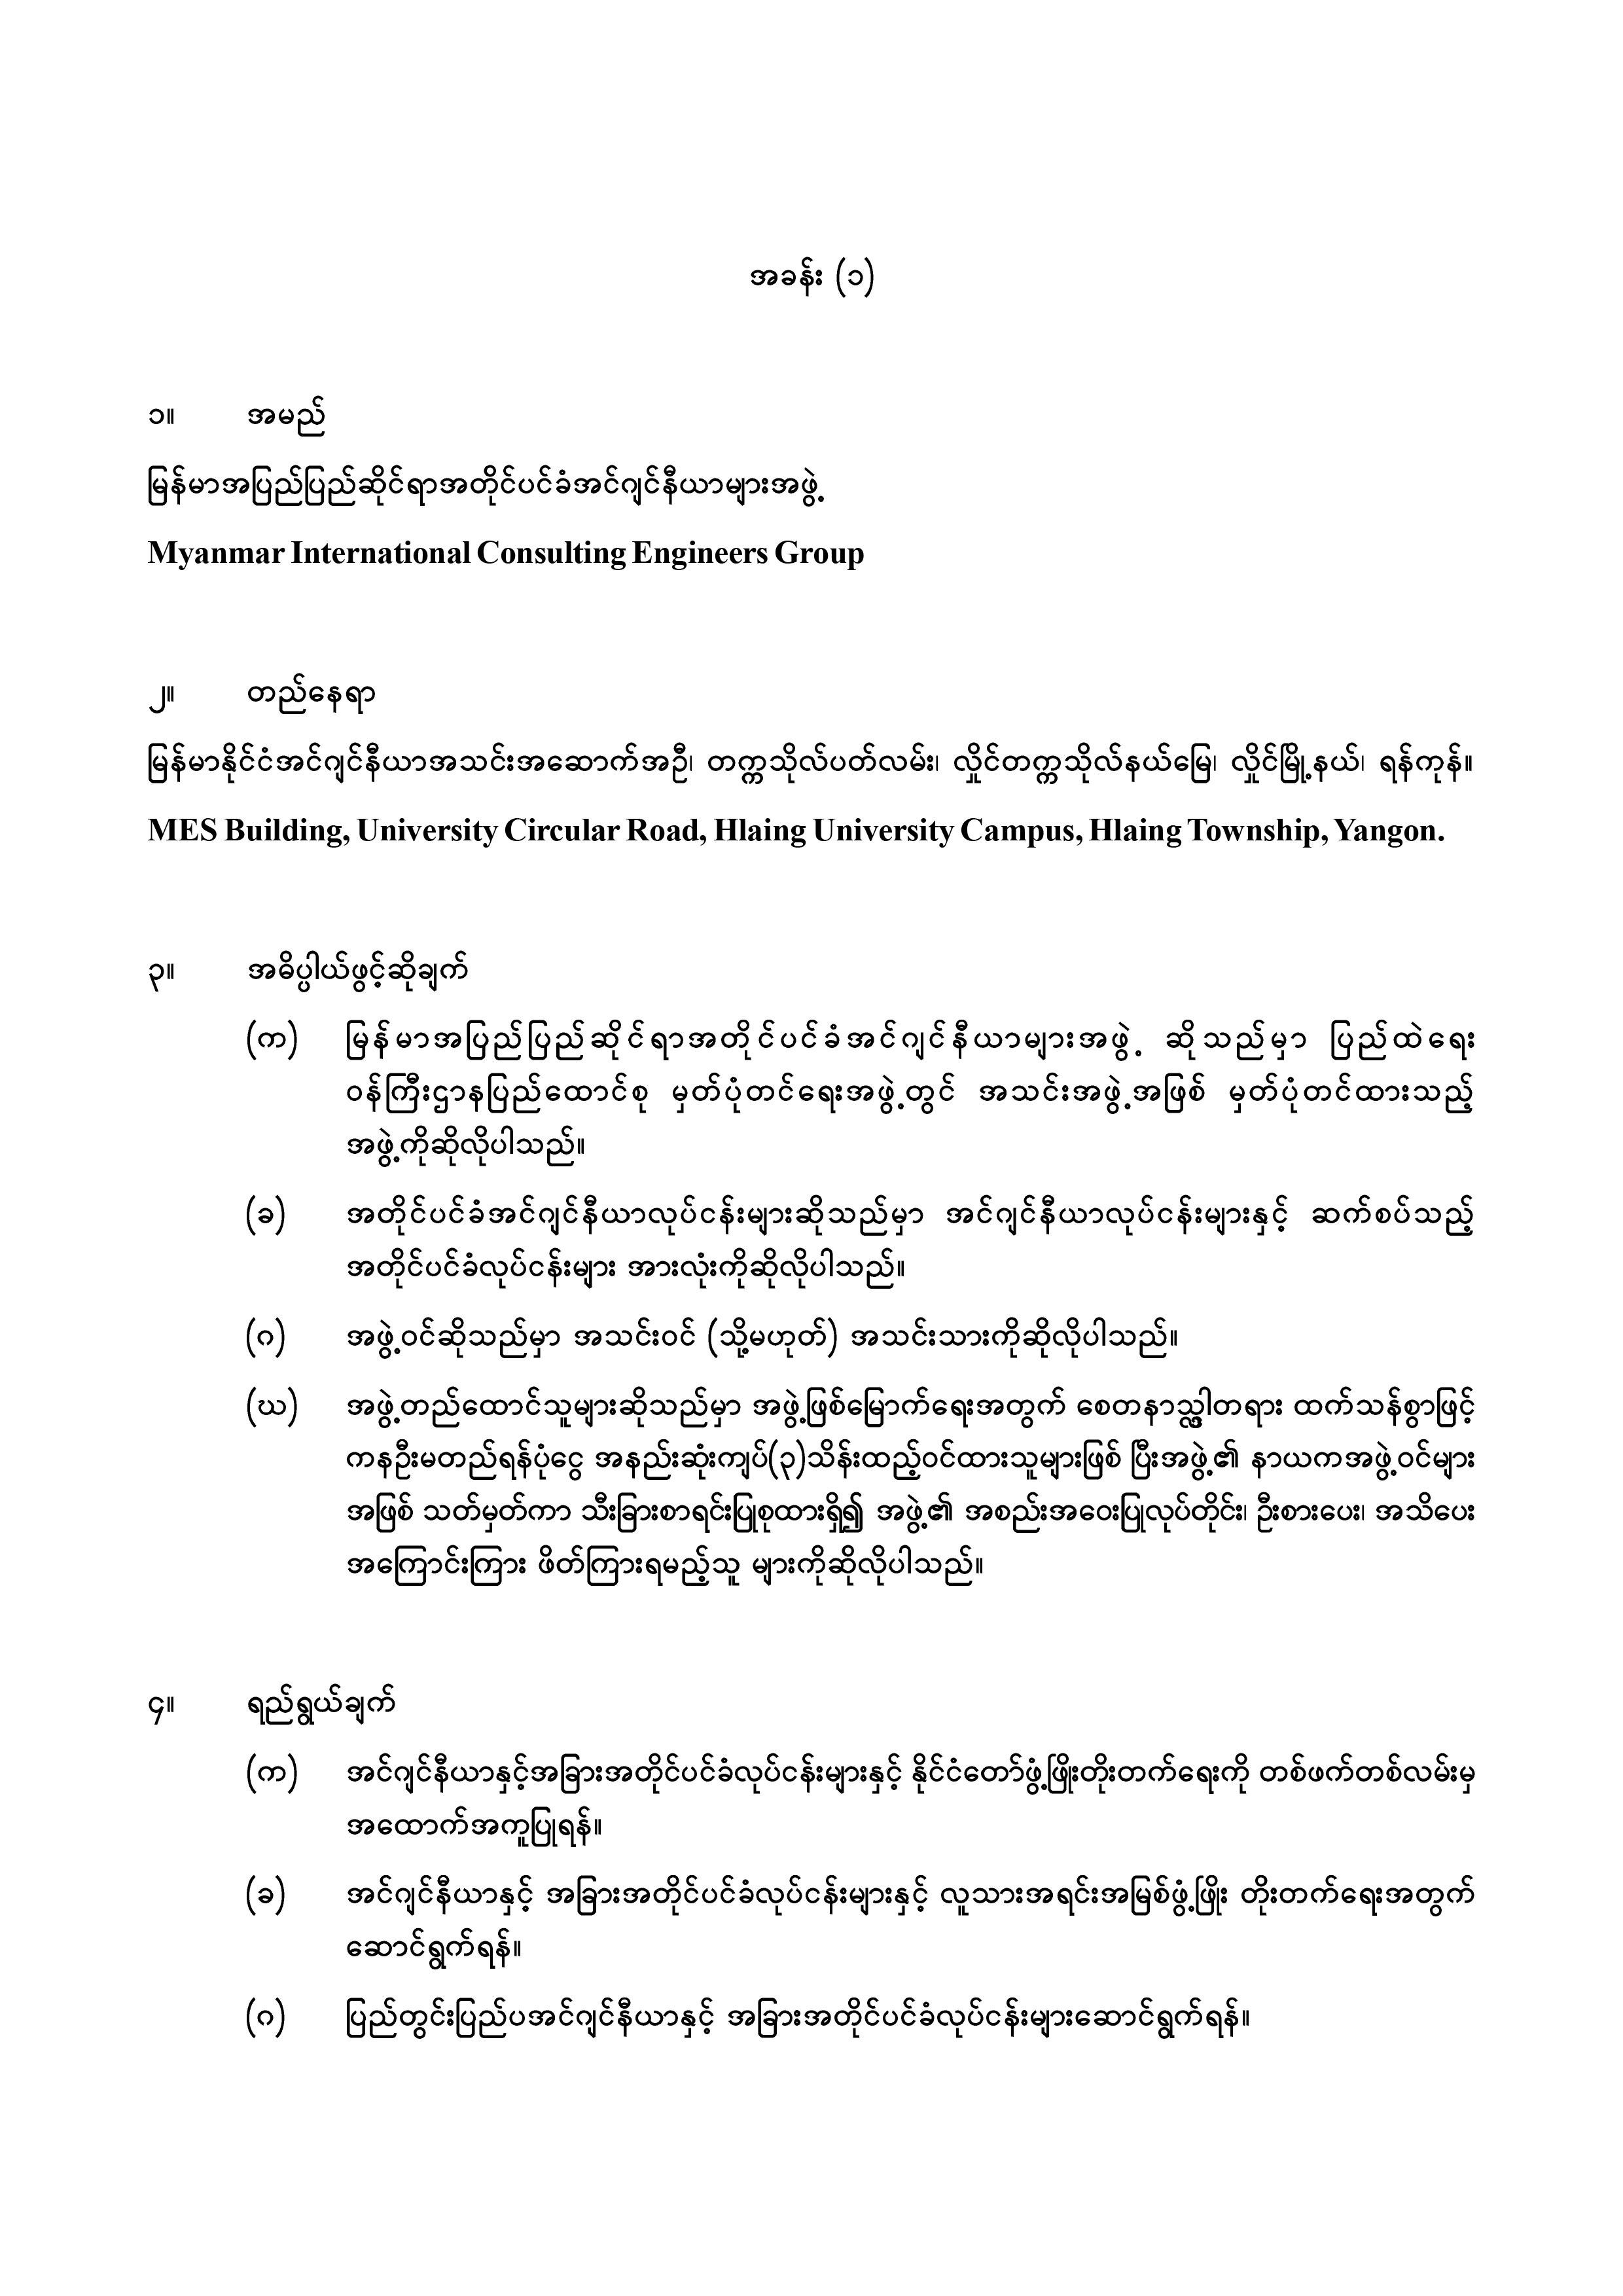 miceg-article-of-association-1